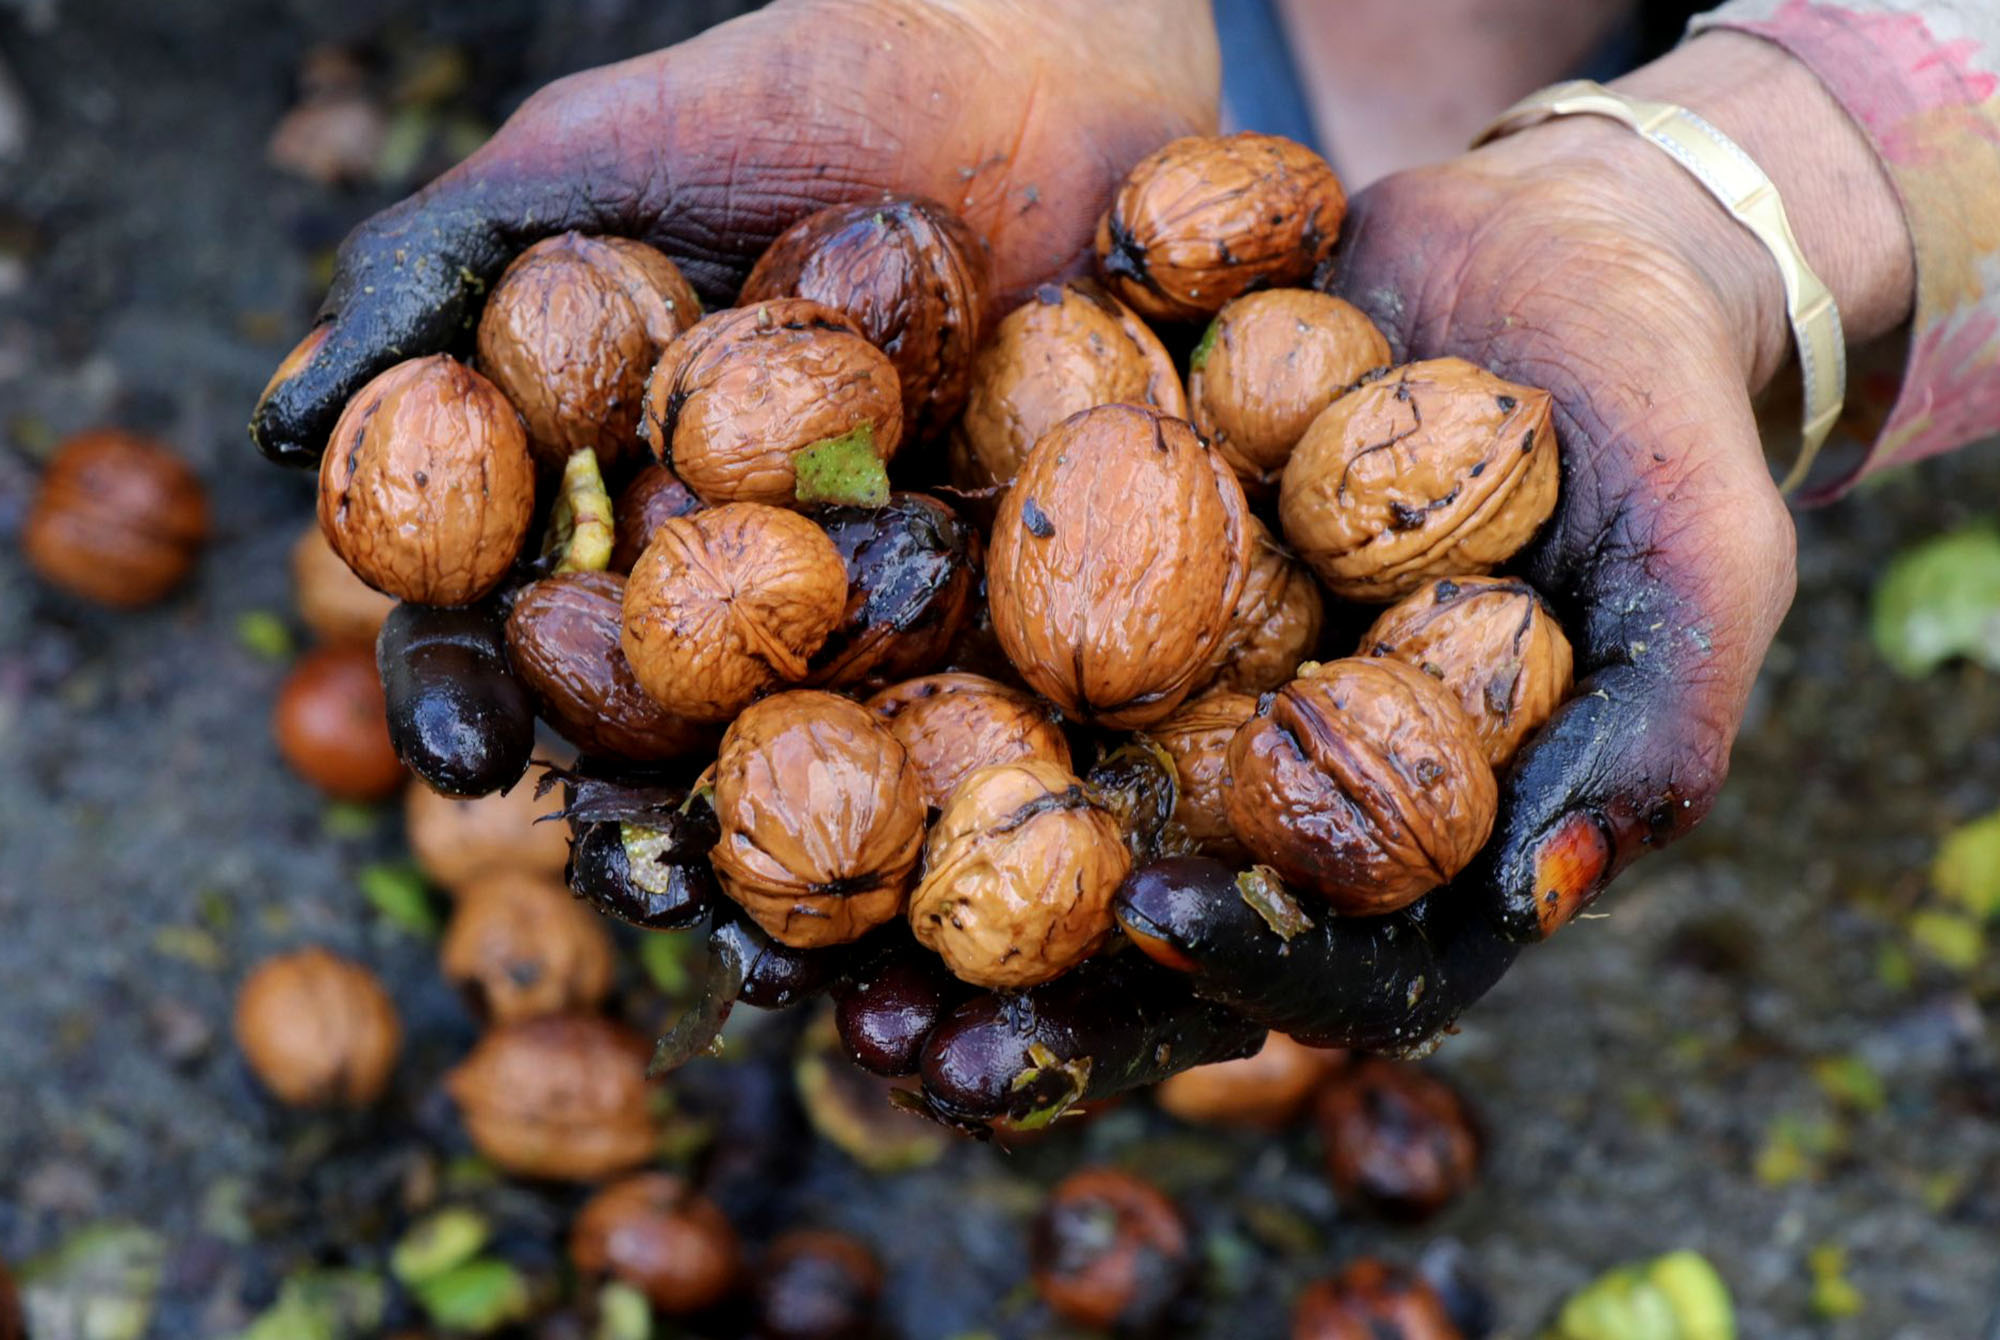 Kashmir's Walnut Harvest Season in Pictures